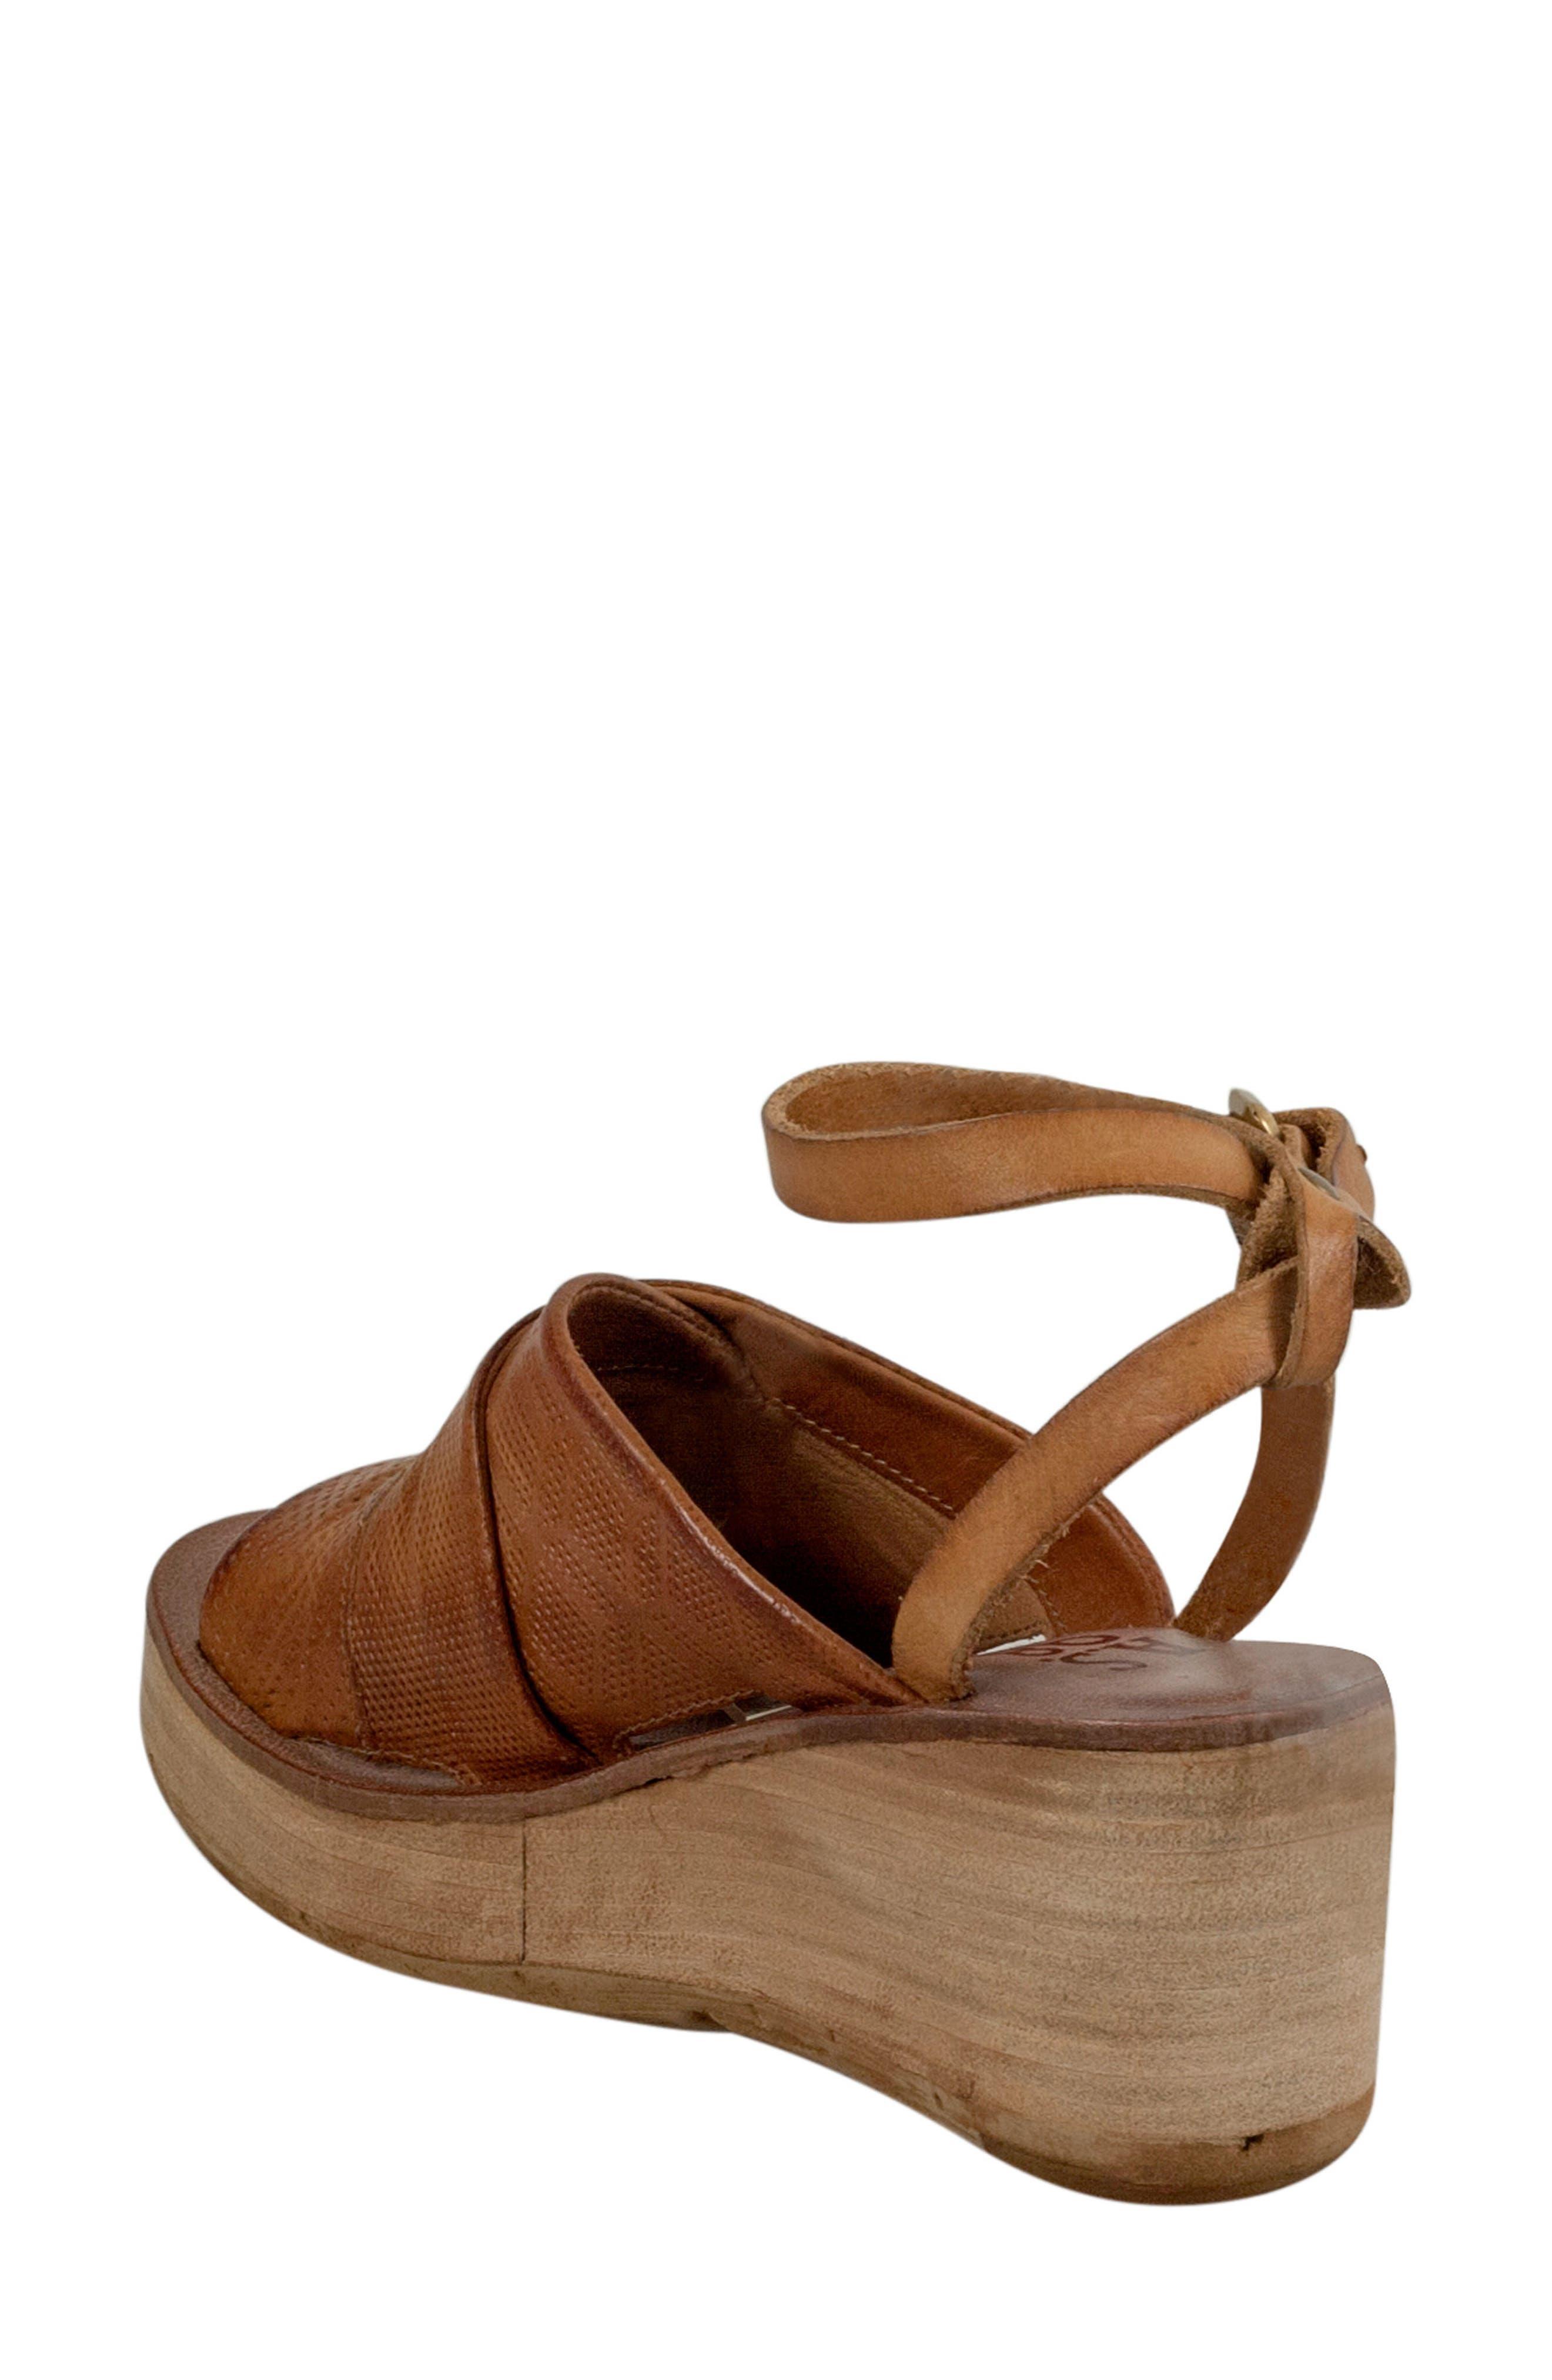 Niall Platform Wedge Sandal,                             Alternate thumbnail 4, color,